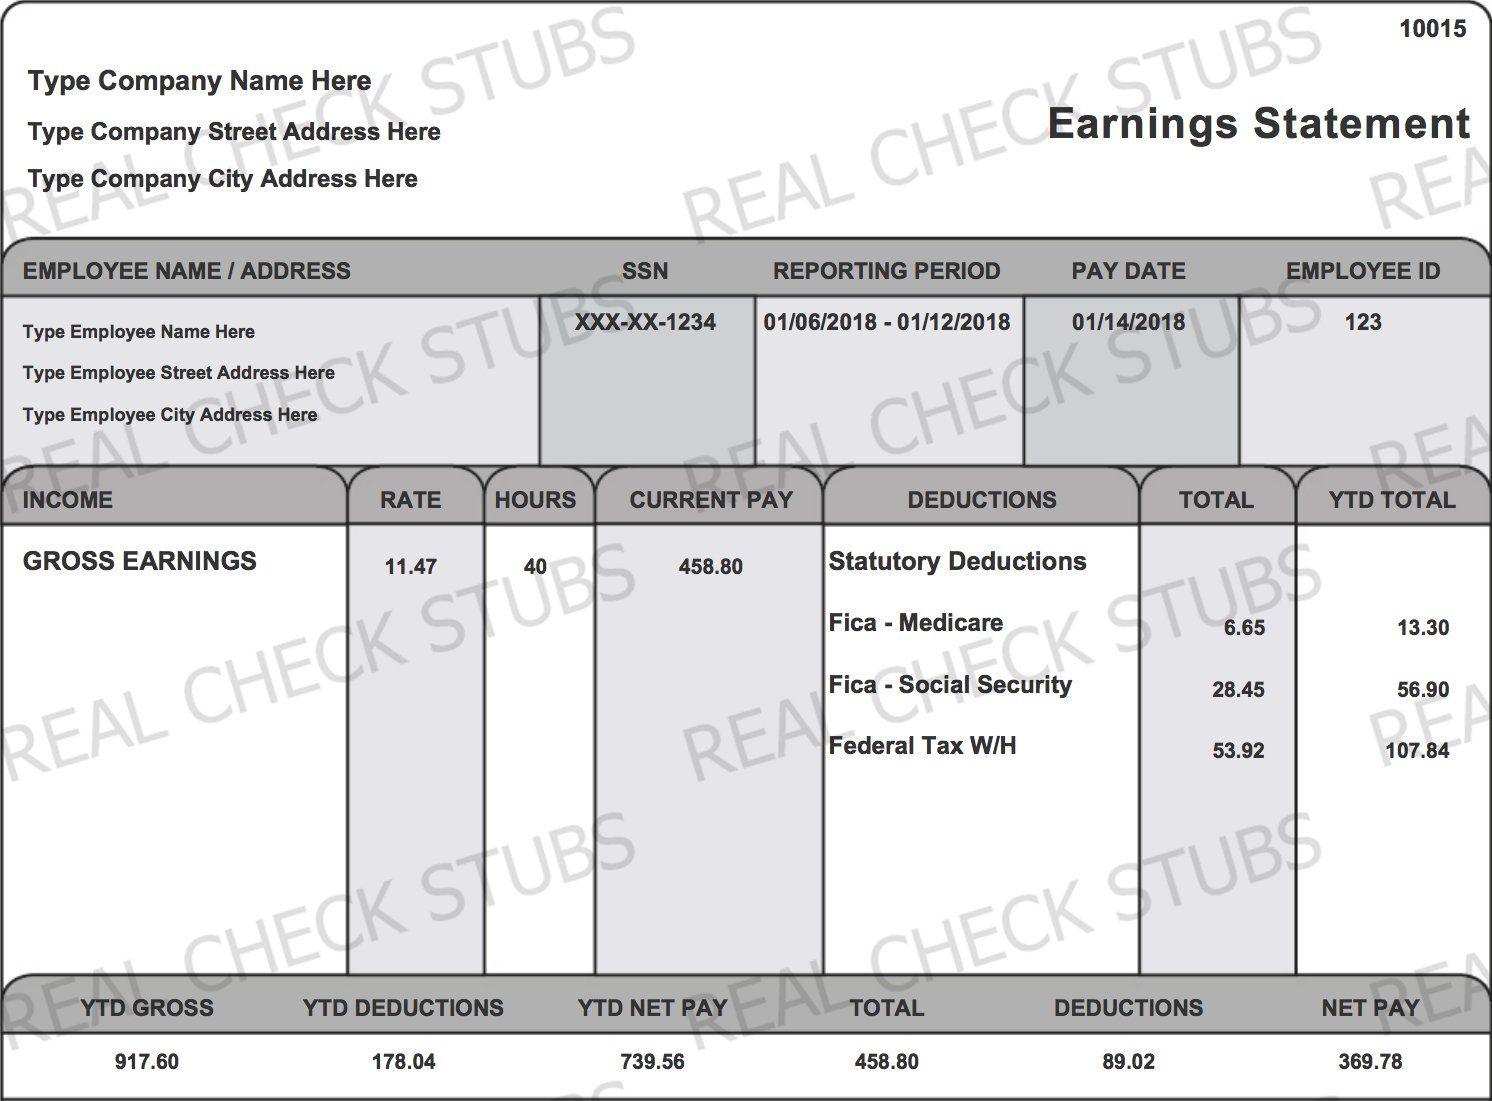 Real Paycheck Stubs Create Stub Paycheck, Real